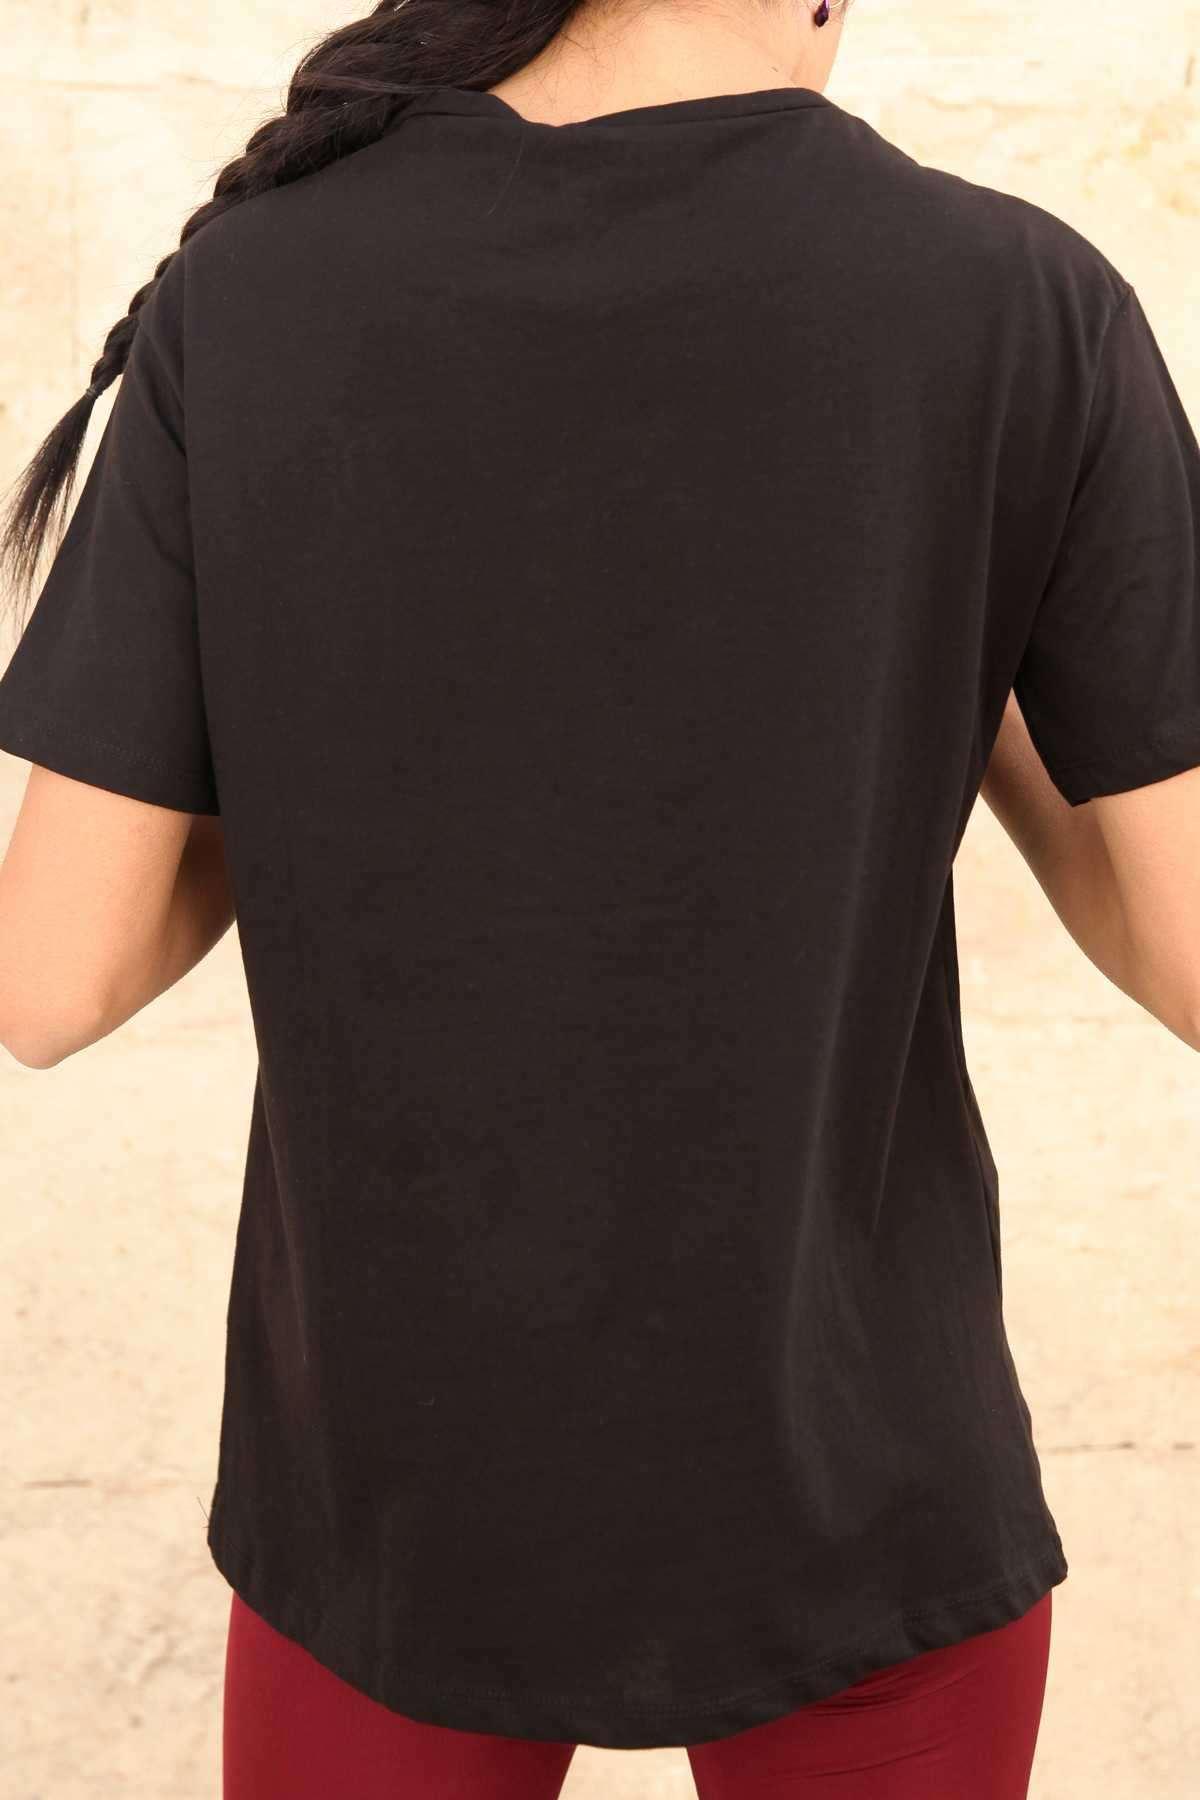 Önü Pullu Kabartma You Yazı Detaylı Simit Yaka Tişört Siyah